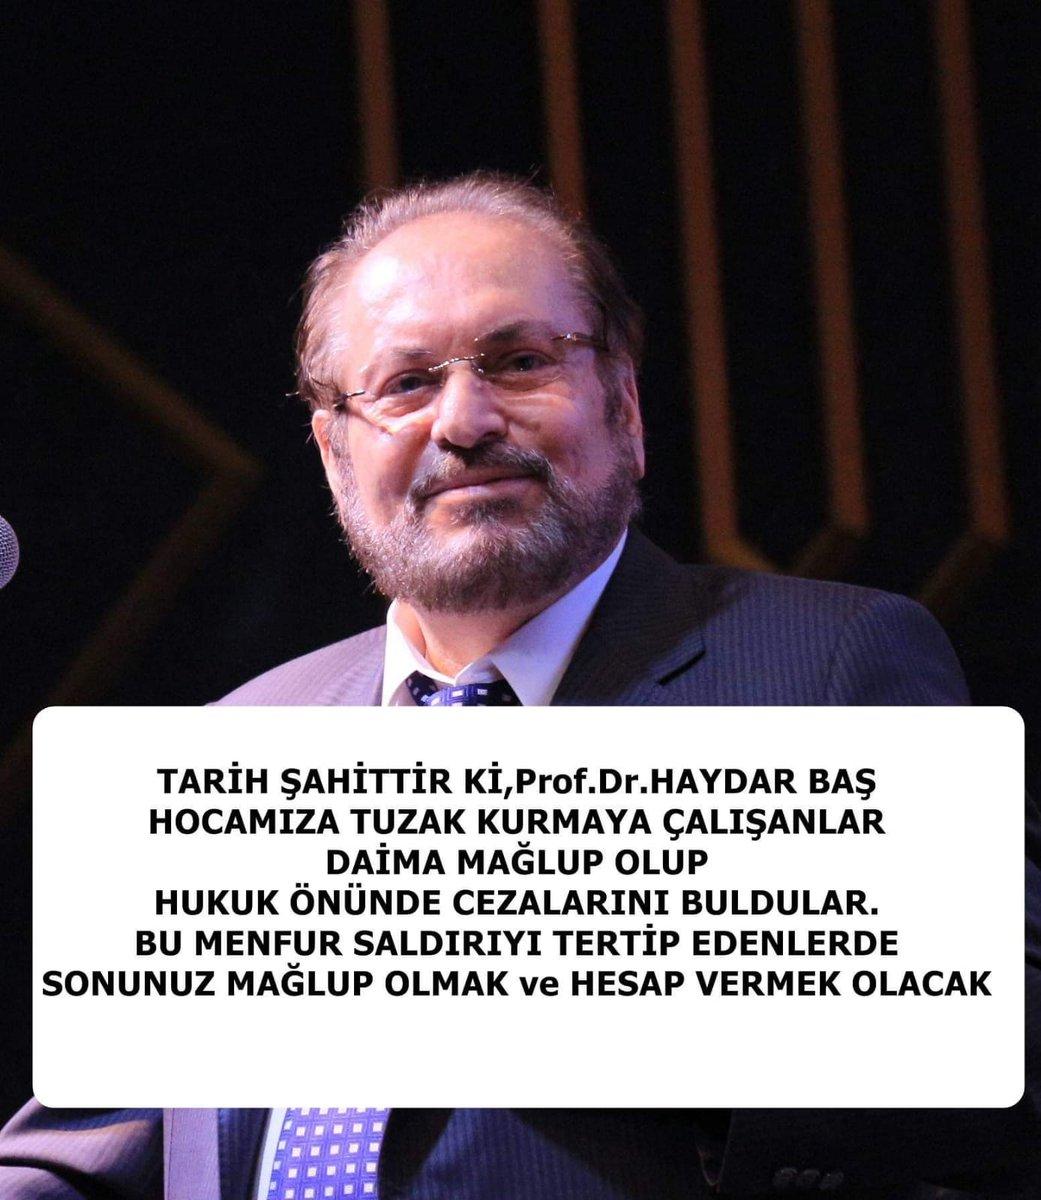 Halil İbrahim Cakin's photo on #HaydarBaşaTuzak